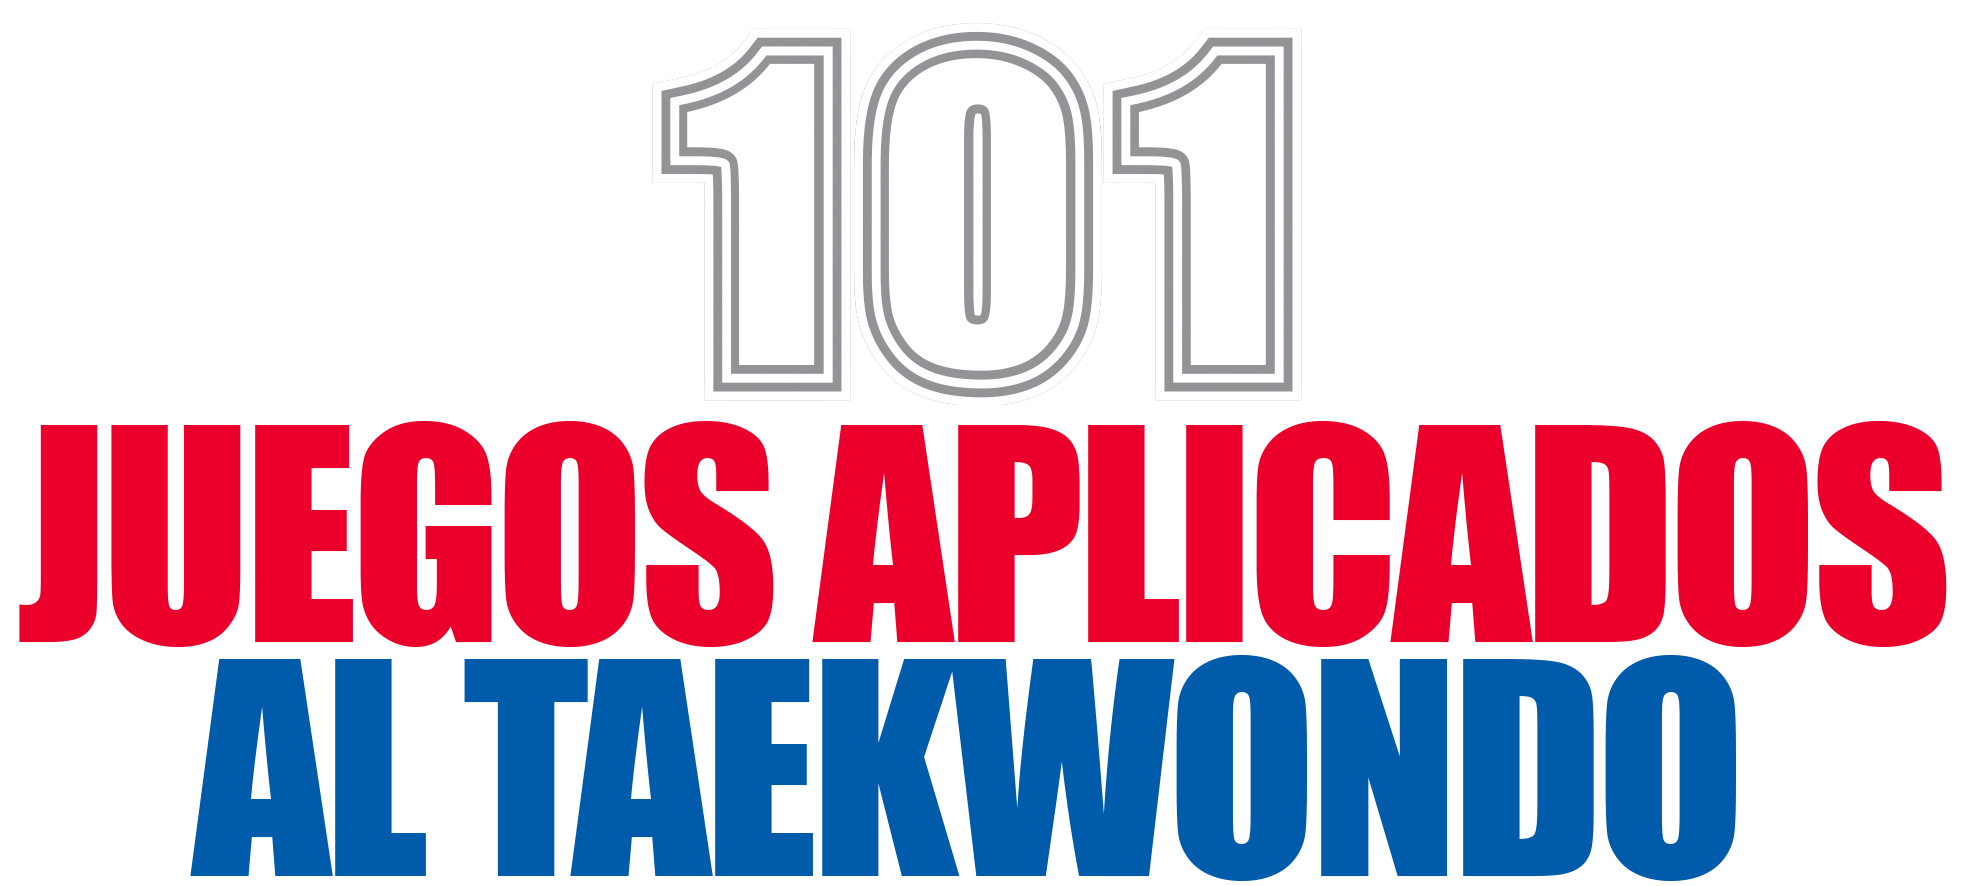 101 Juegos Aplicados al Taekwondo